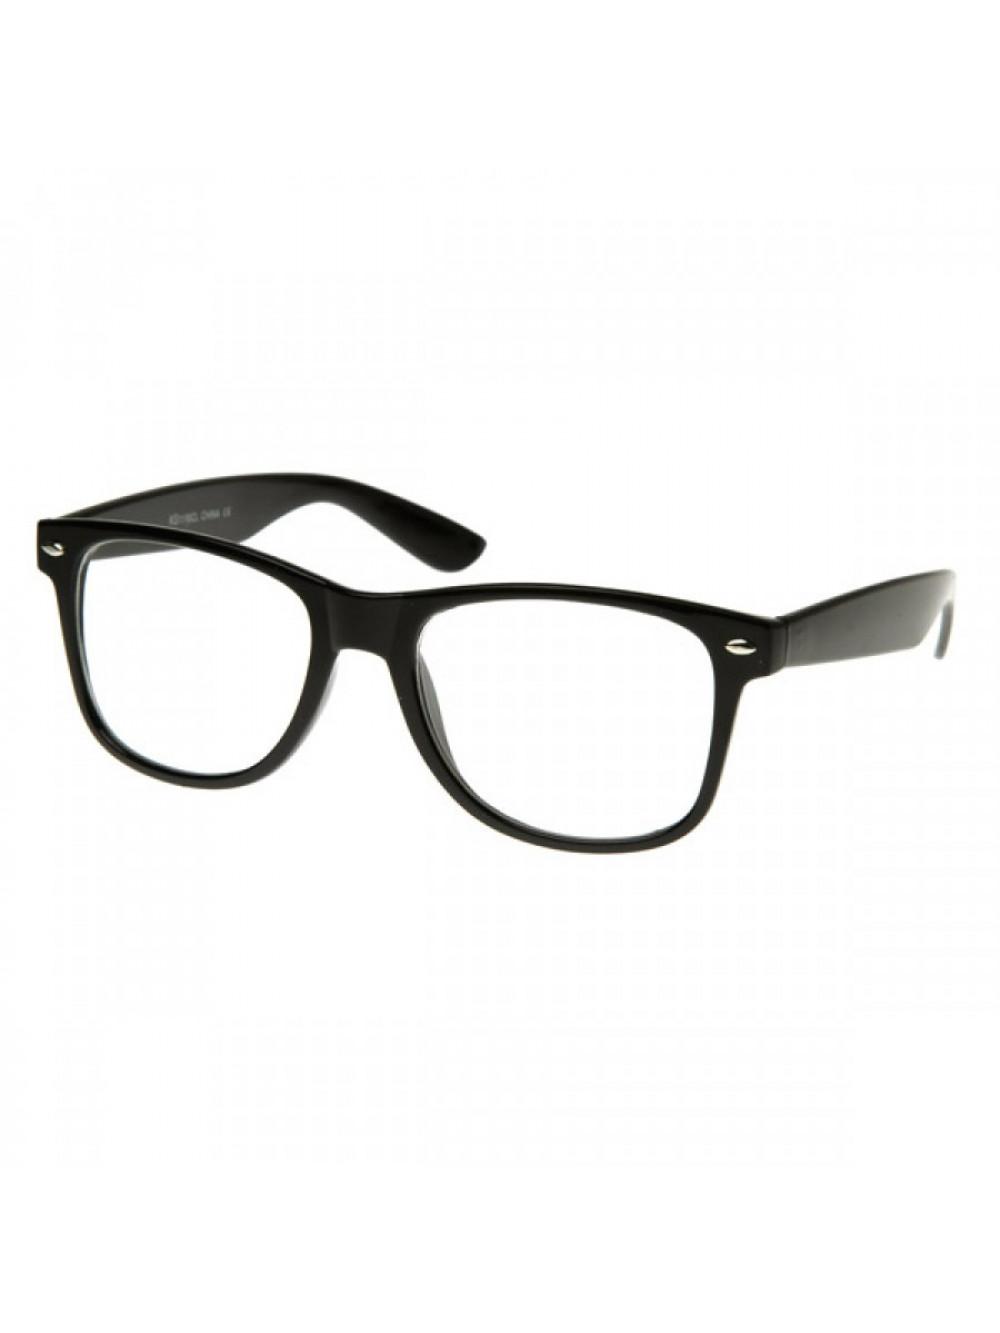 Okuliare Wayfarer Black Nerd